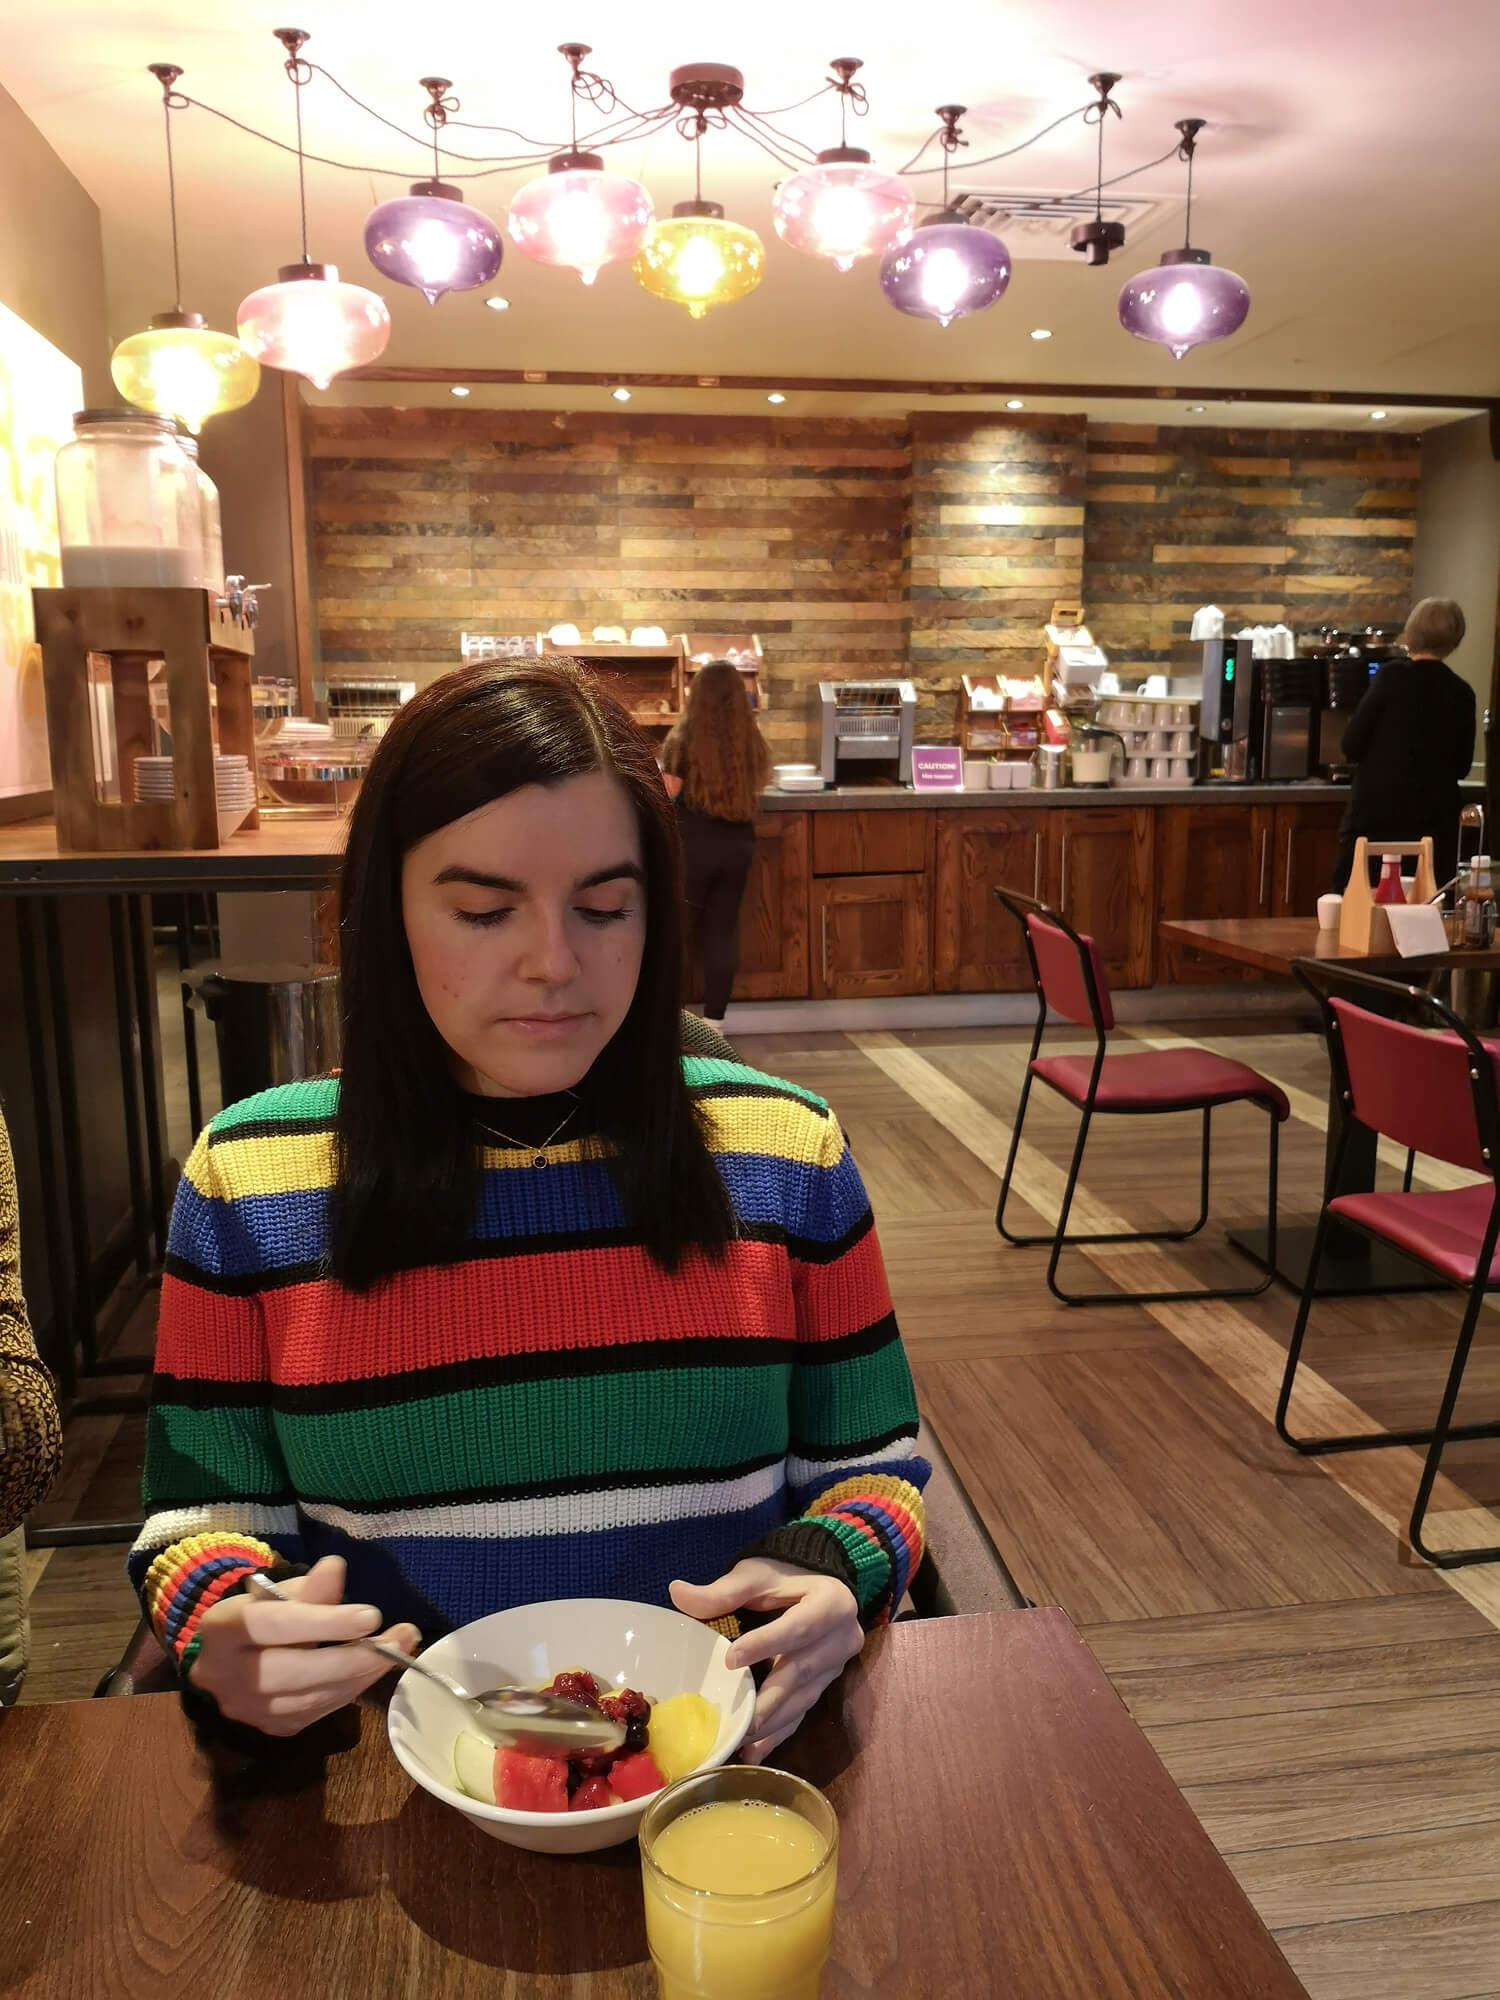 Emma eating breakfast at her Premier Inn hotel. Emma is wearing a multicoloured stripe jumper.